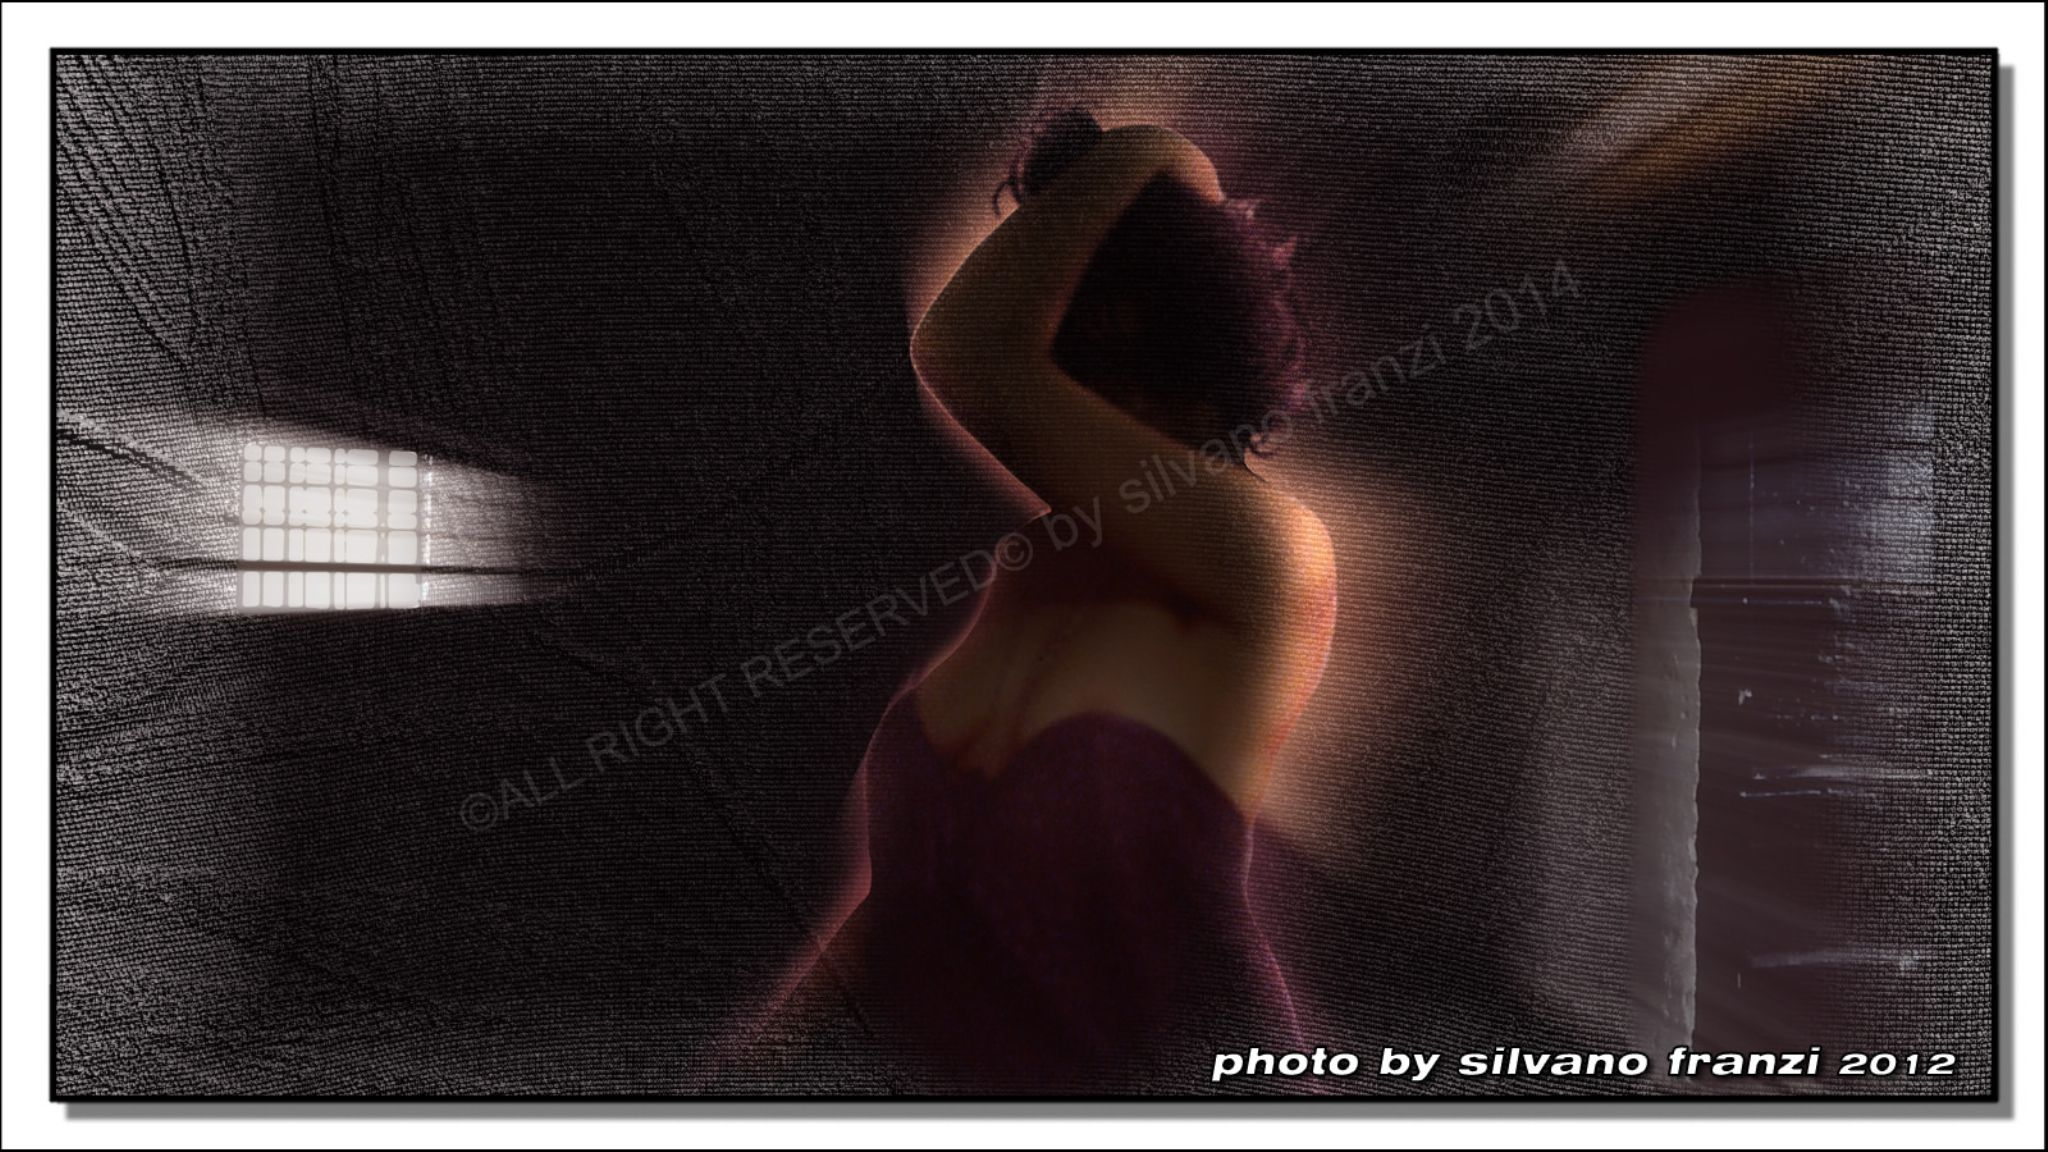 Backlight by SILVANO FRANZI